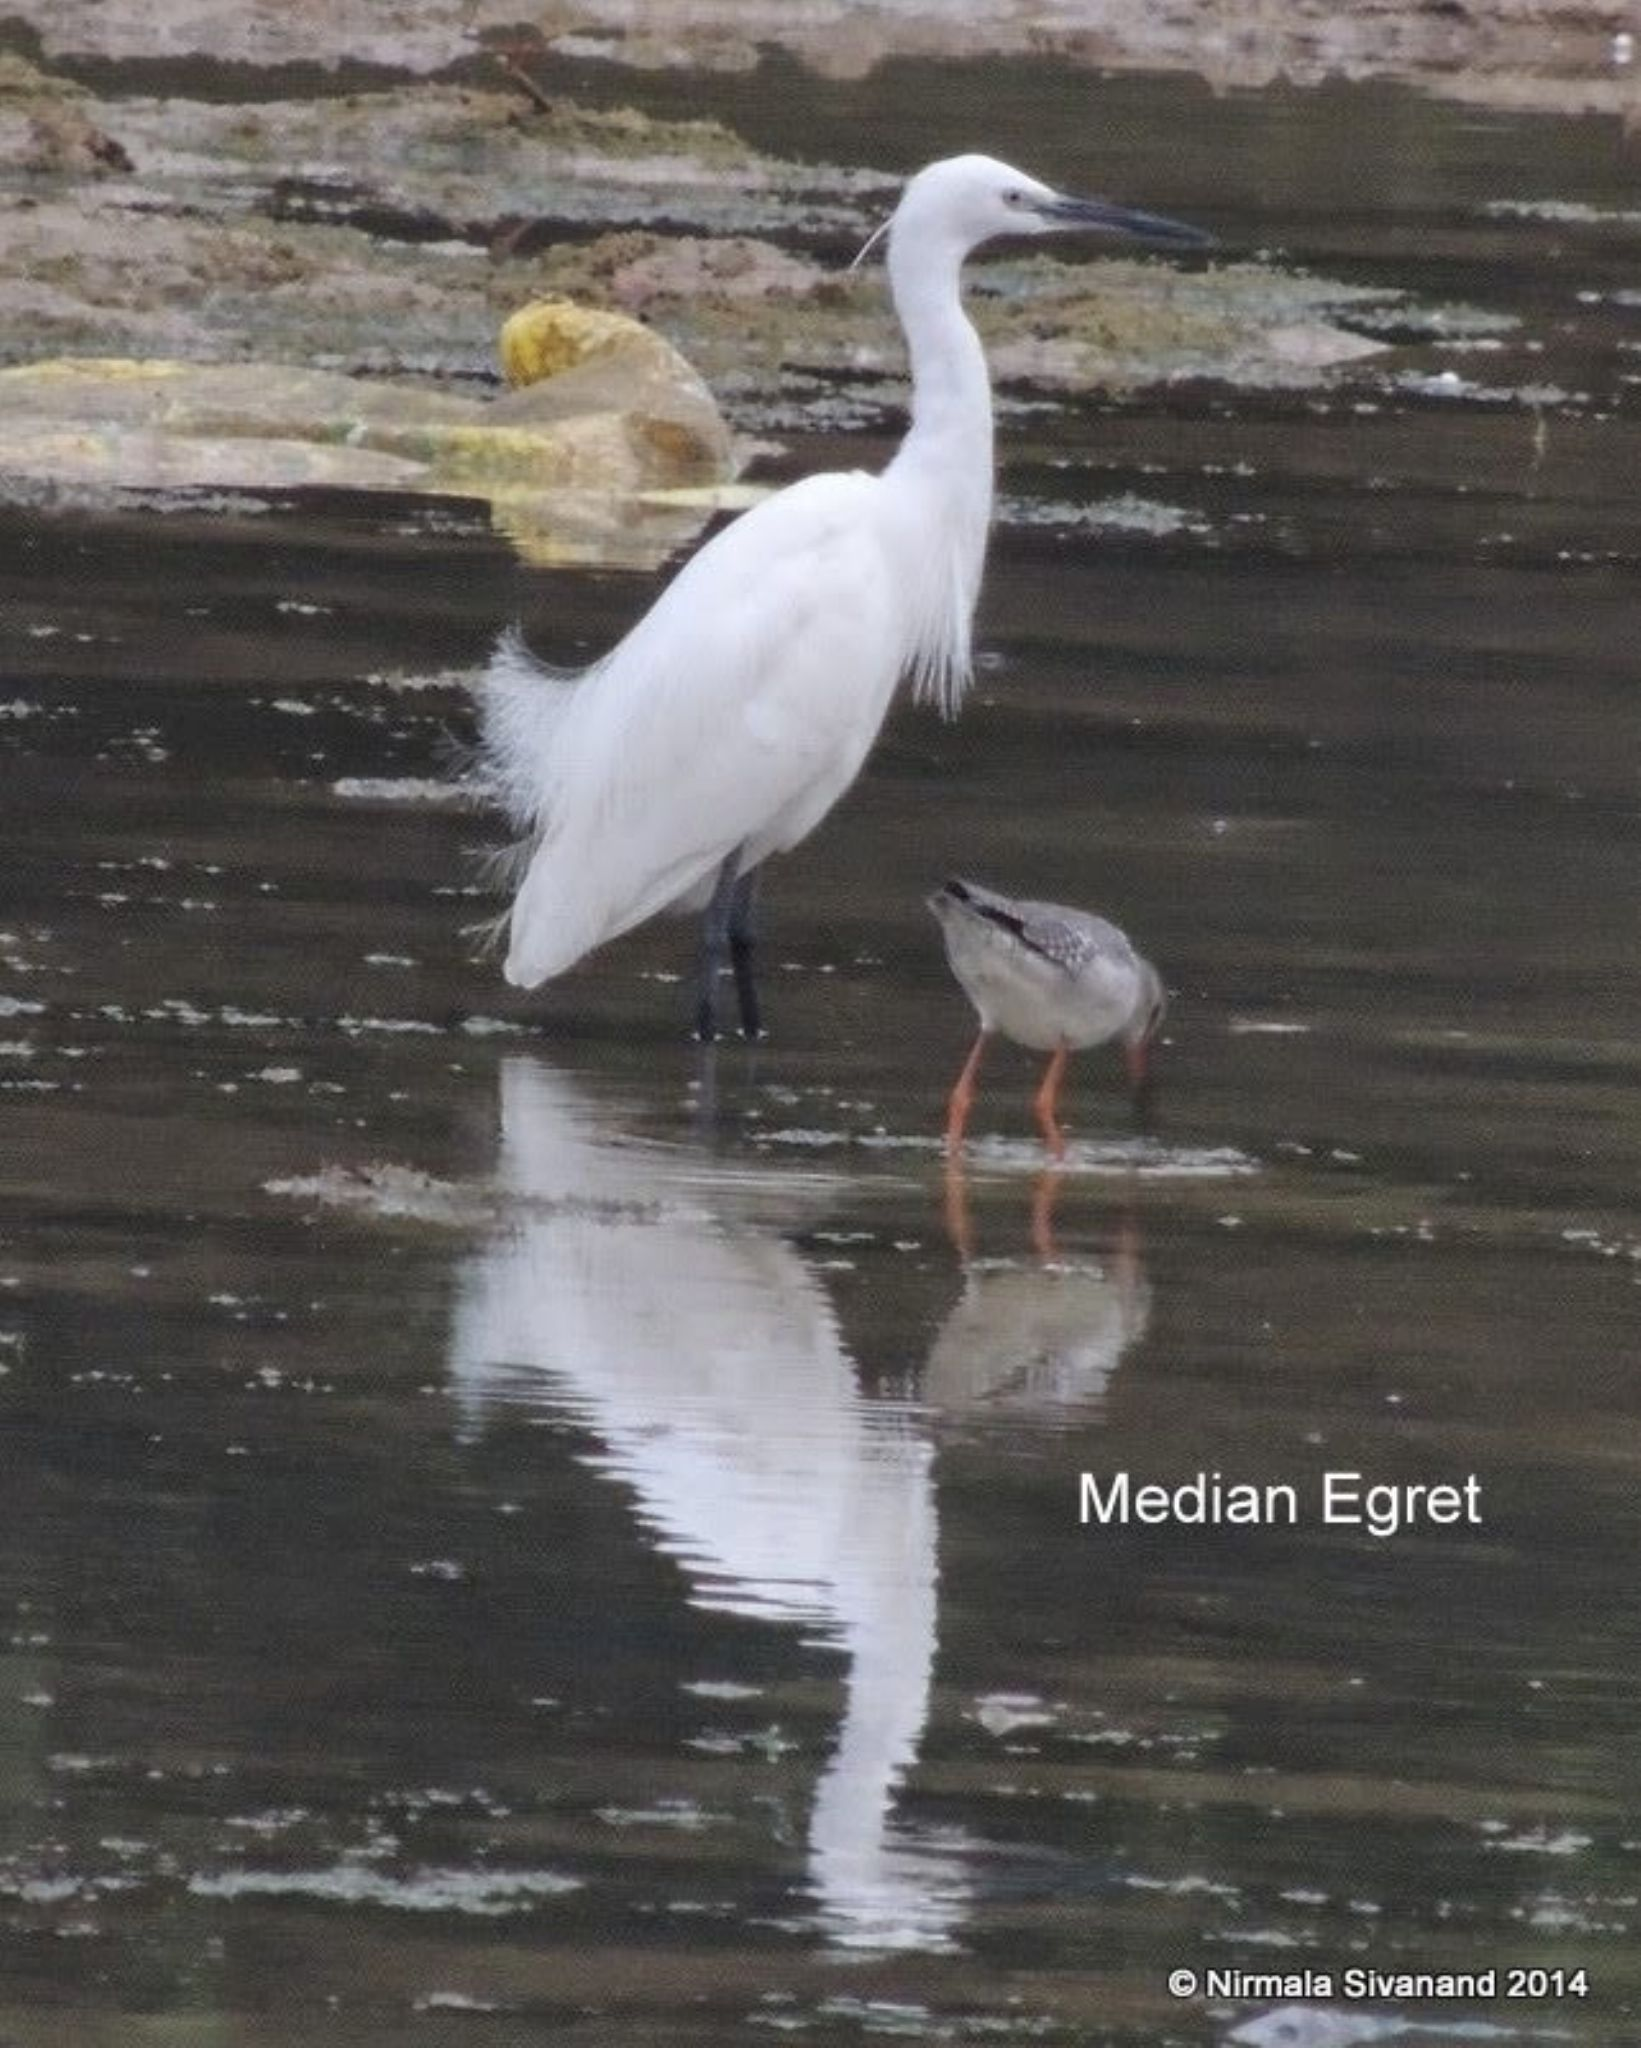 Little egret by Nirmala Sivanand